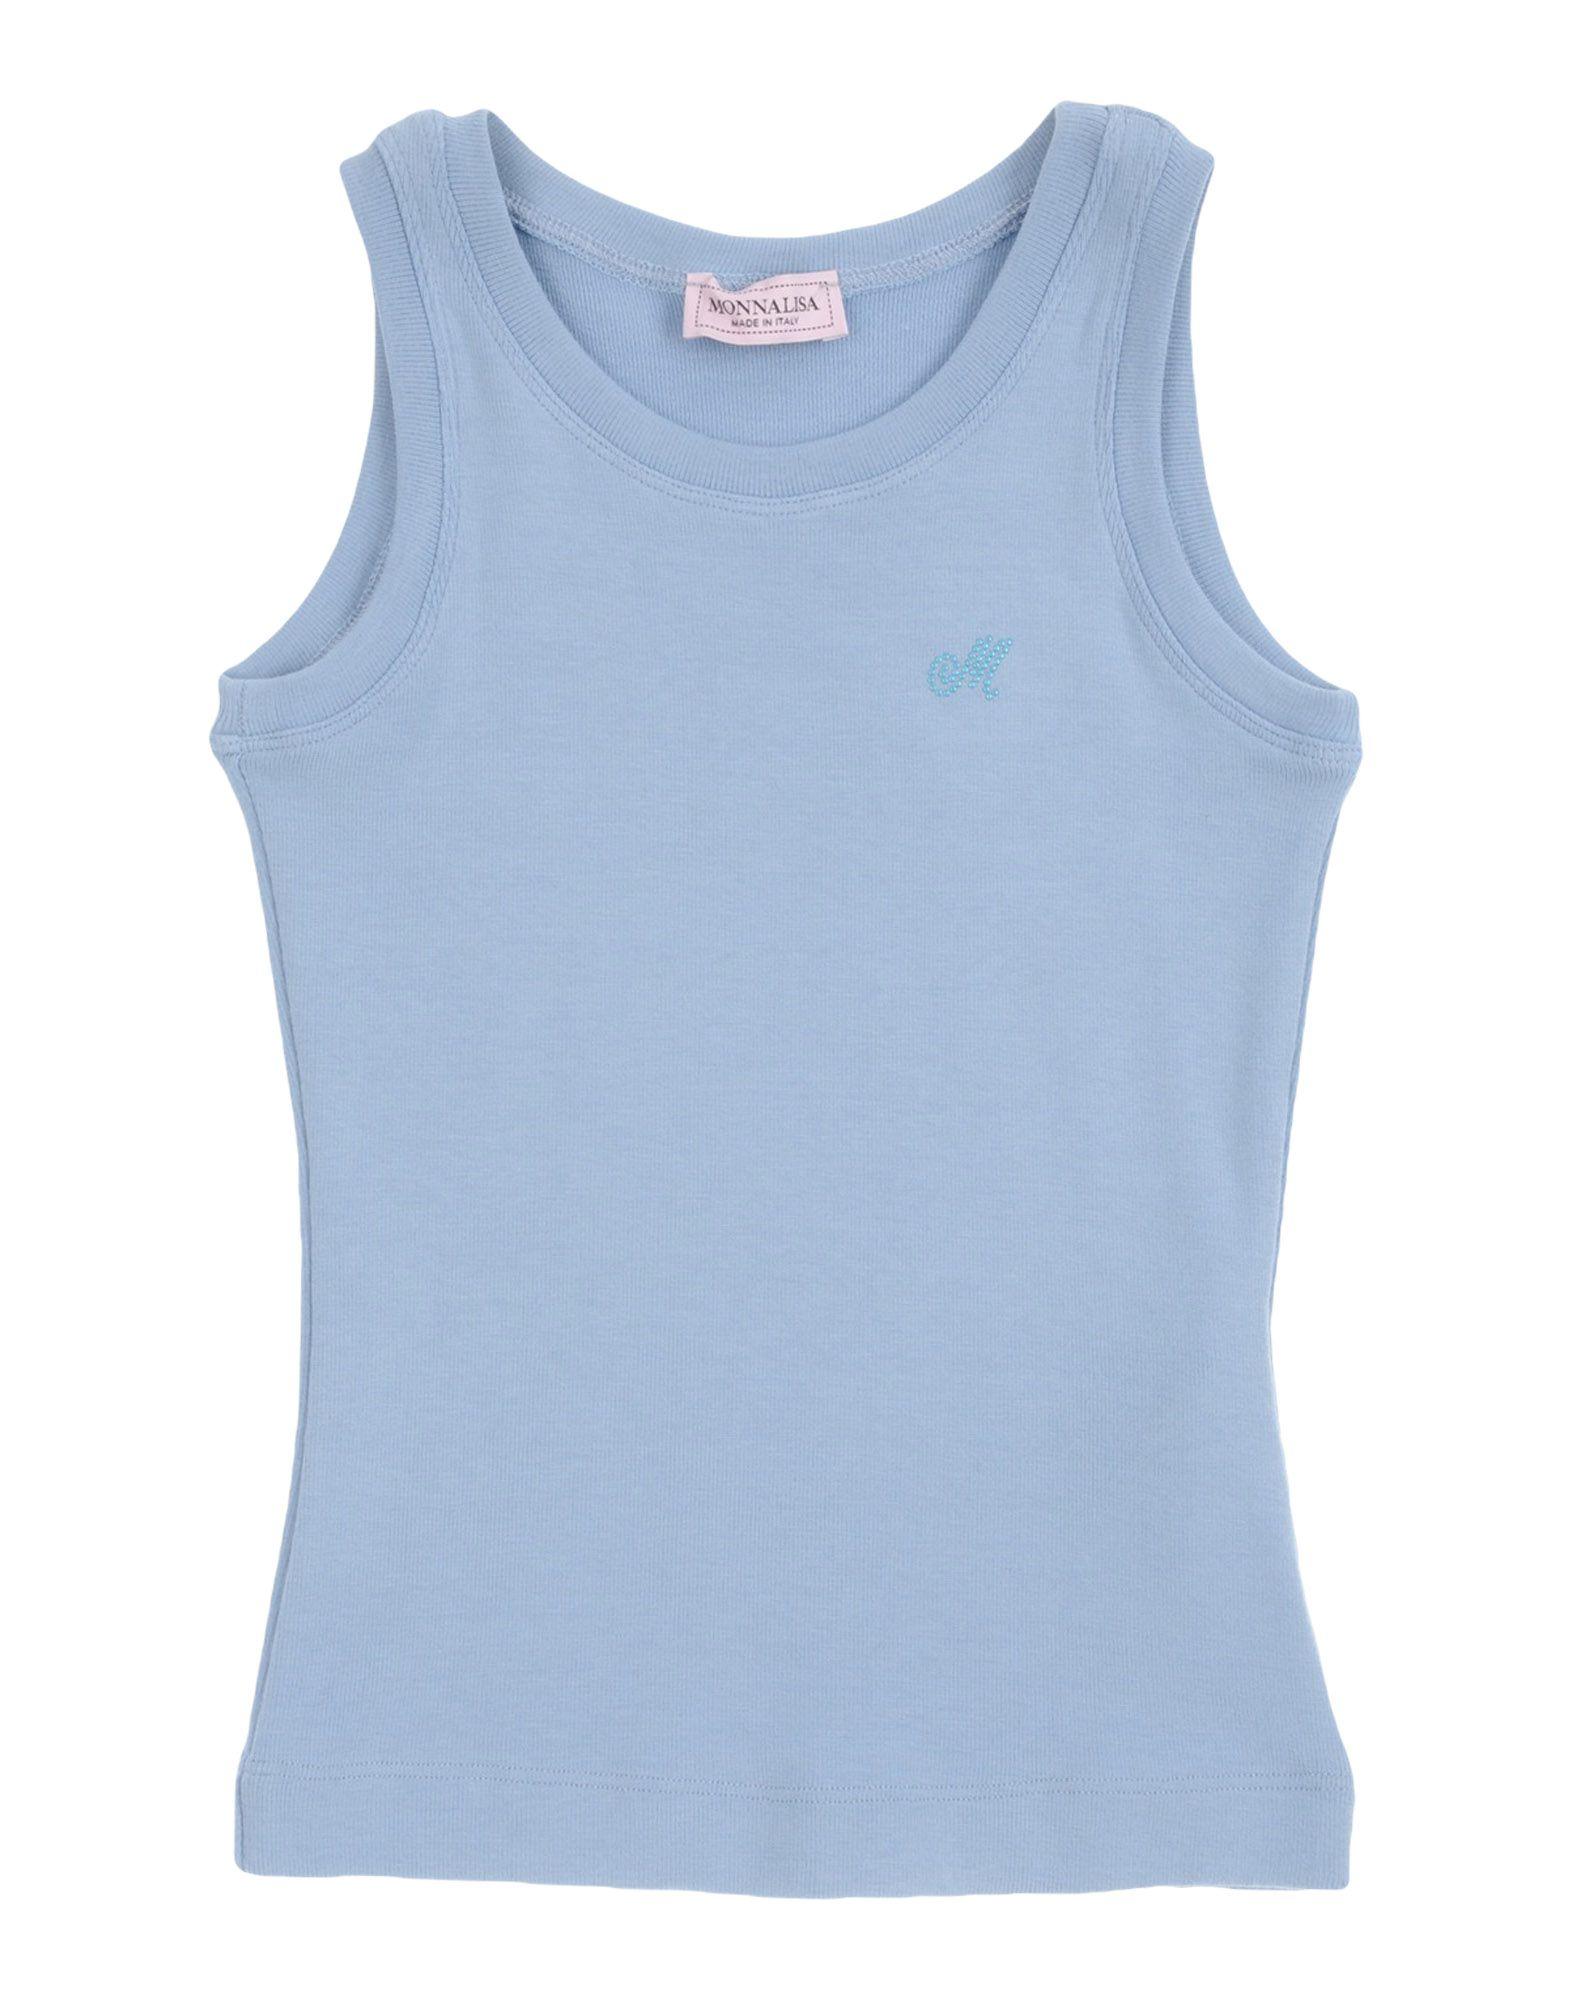 Monnalisa Kids' T-shirts In Blue